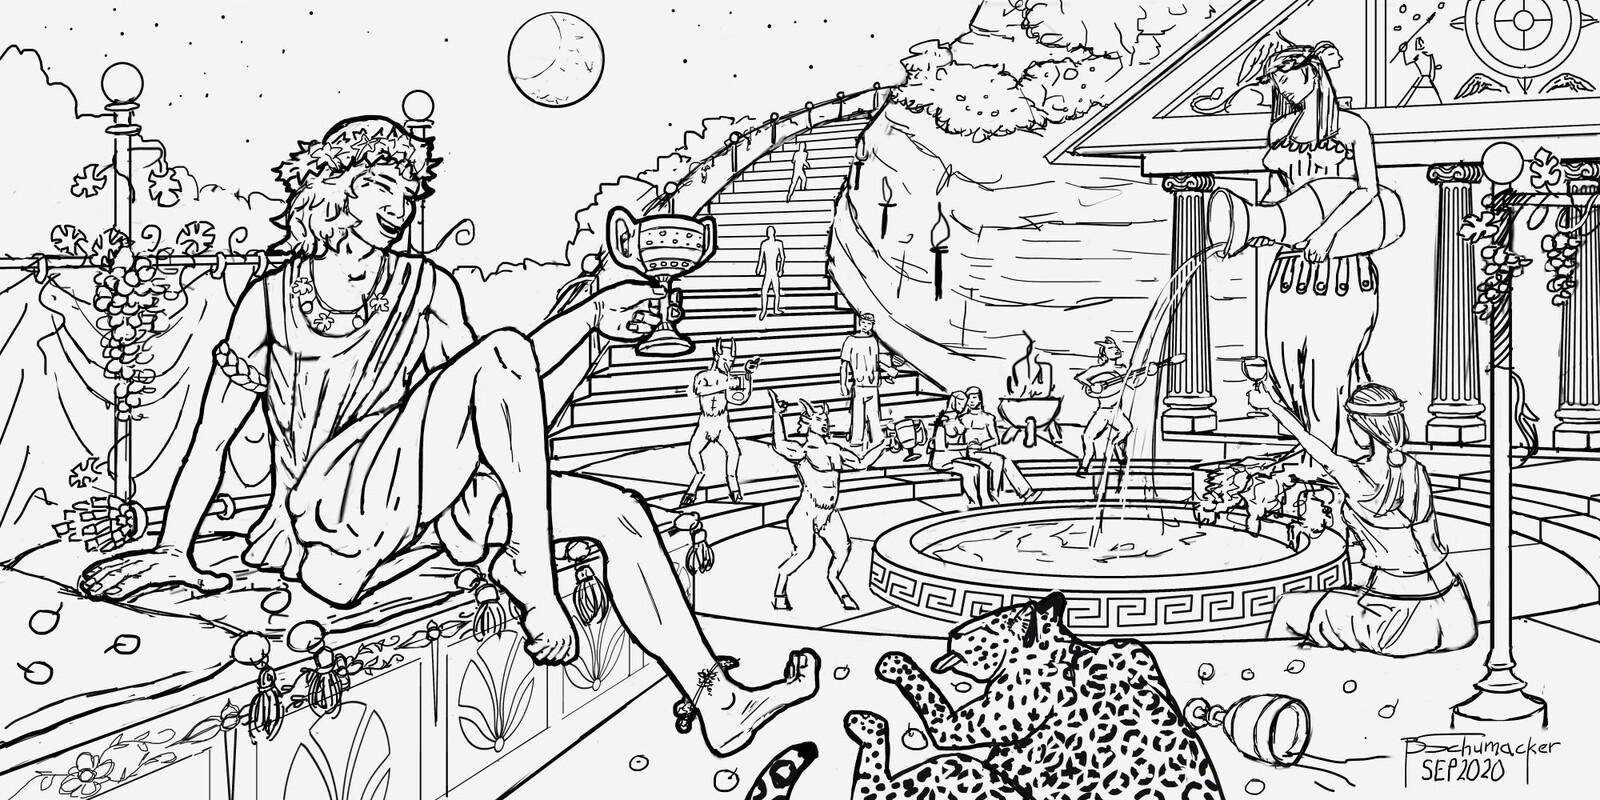 Dionysus - God of Wine (drawing)